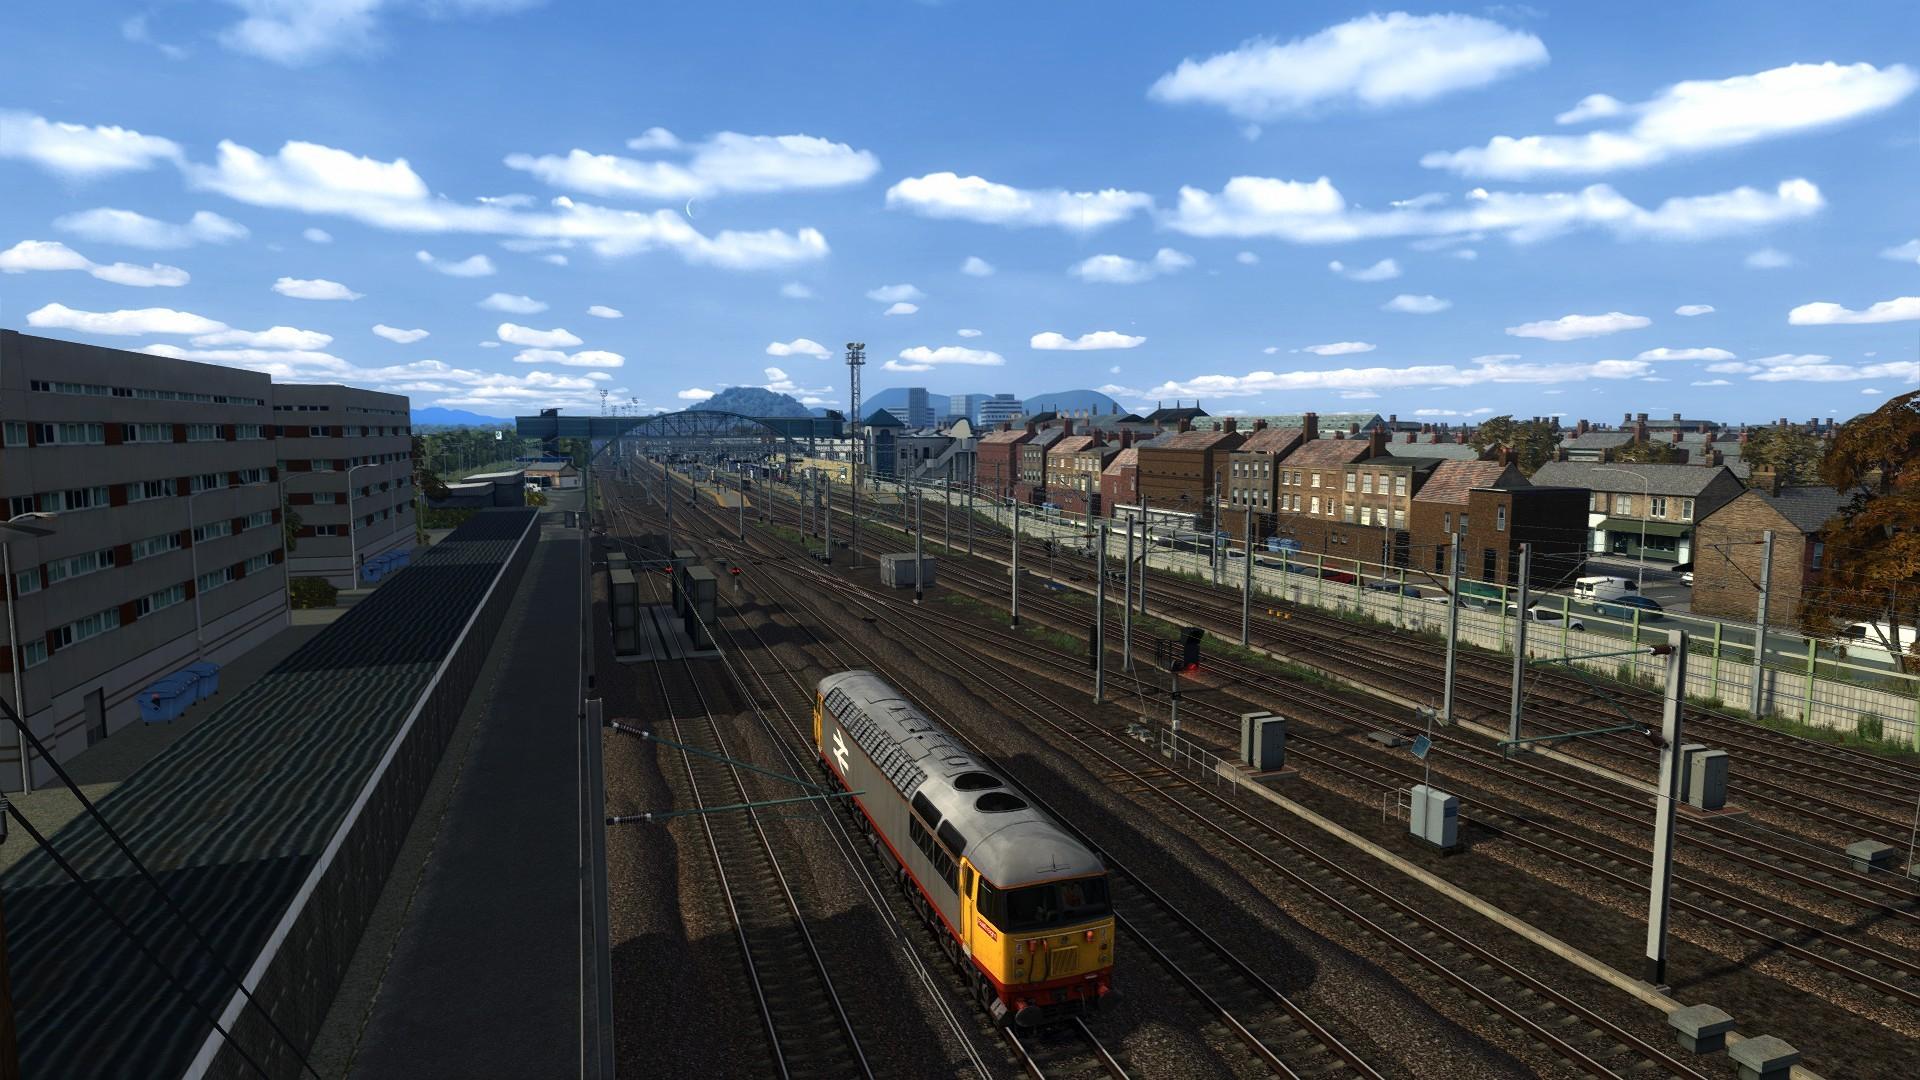 Serinathea sidings